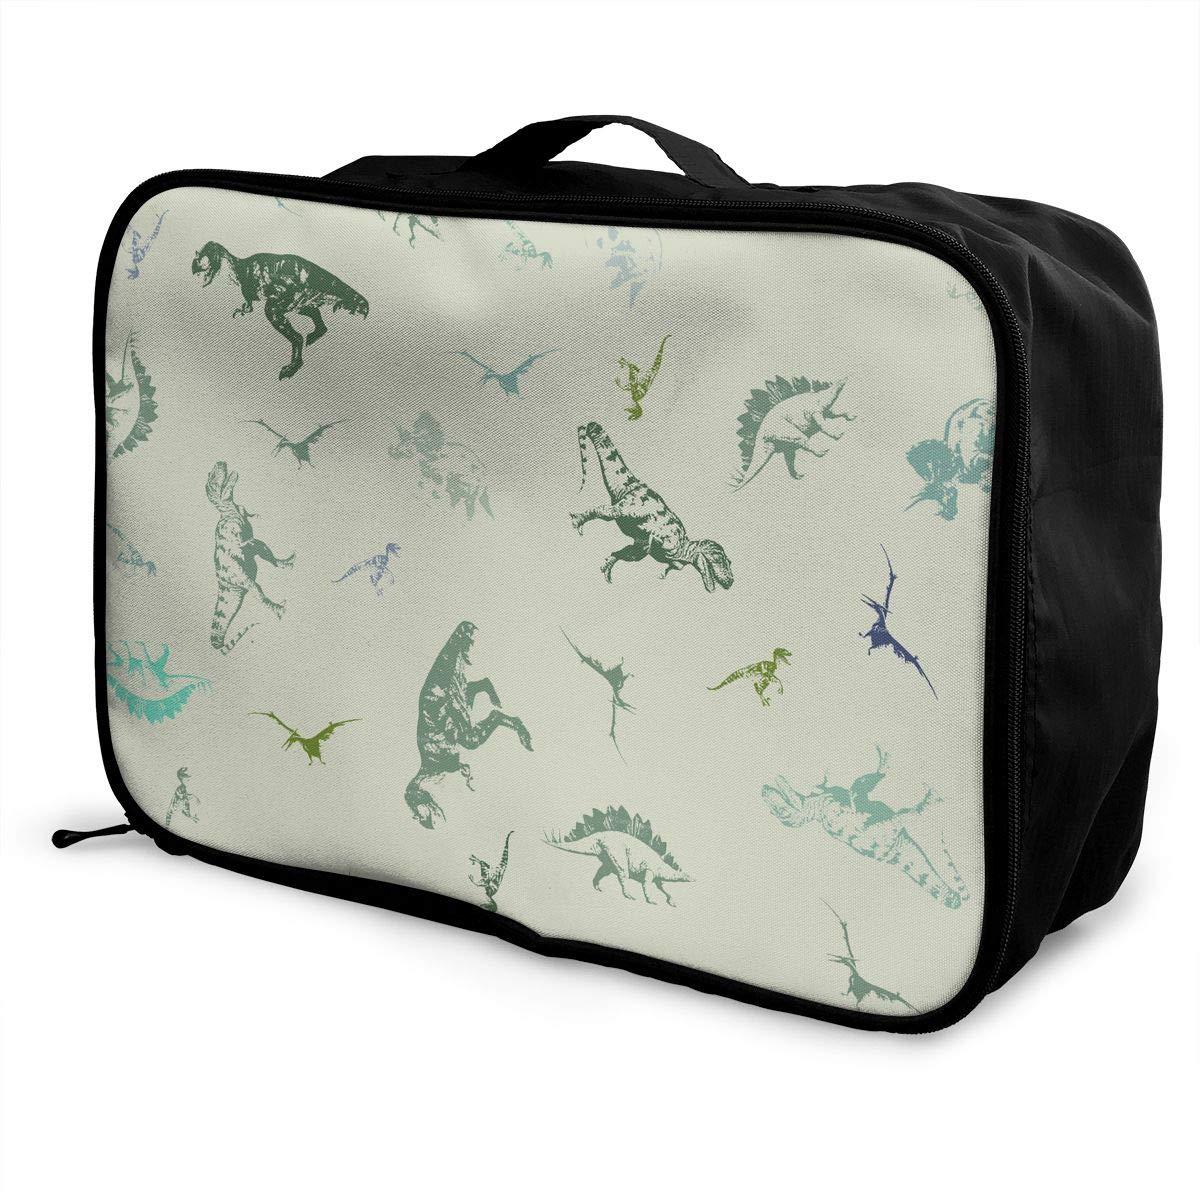 Travel Luggage Duffle Bag Lightweight Portable Handbag Dinosaurs Print Large Capacity Waterproof Foldable Storage Tote